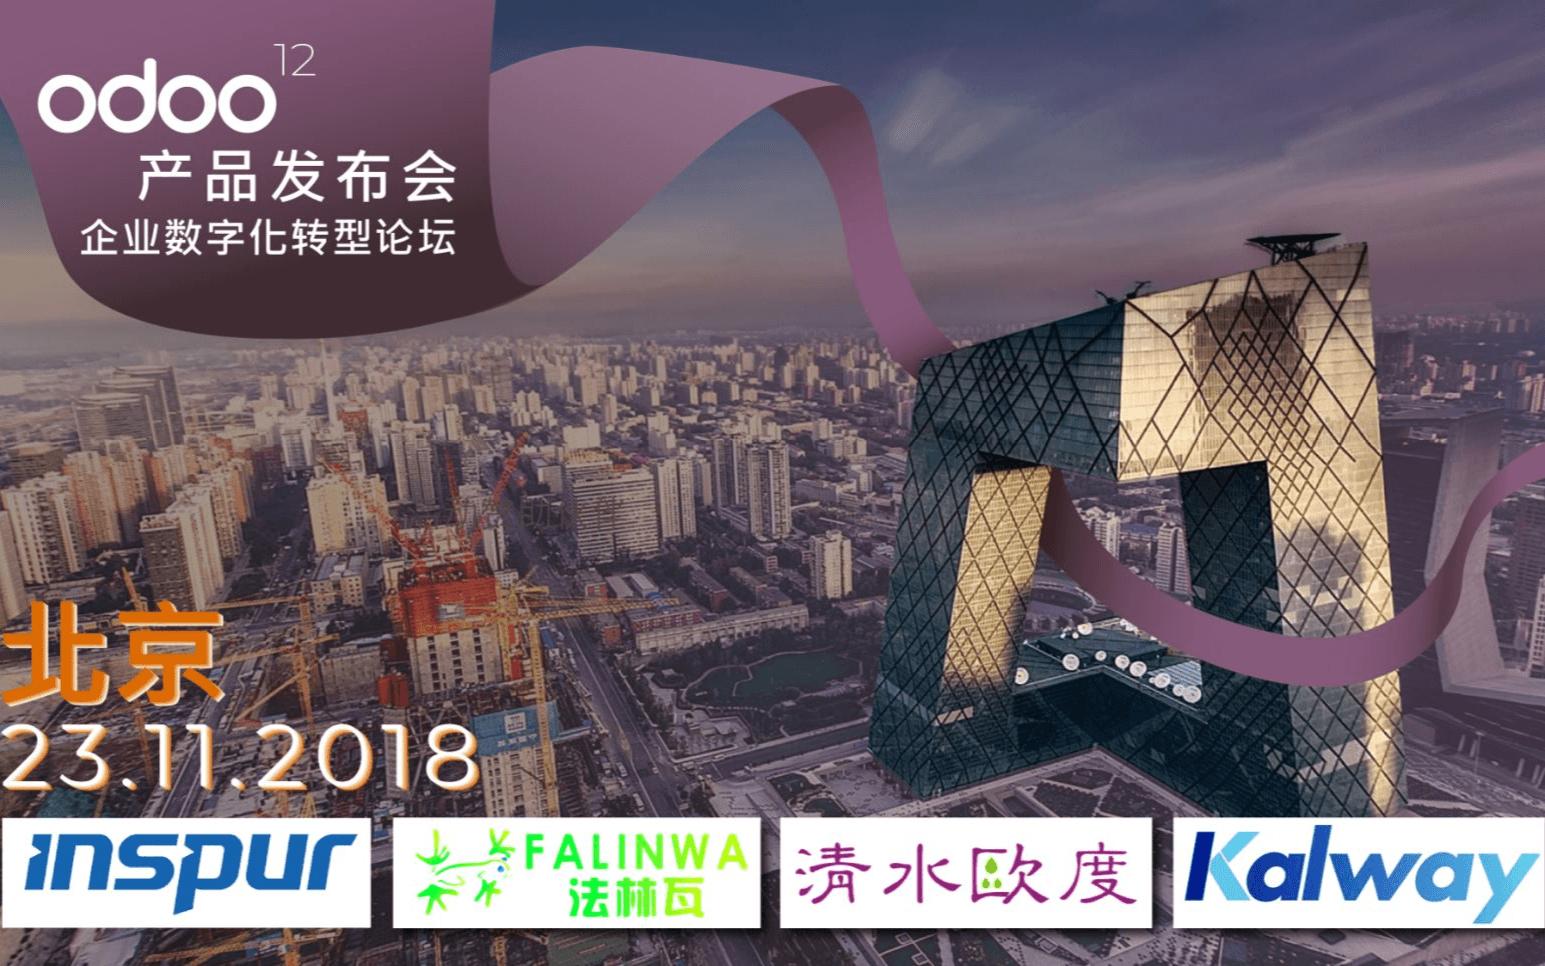 Odoo 12 北京产品发布会暨企业数字化转型论坛2018(北京)